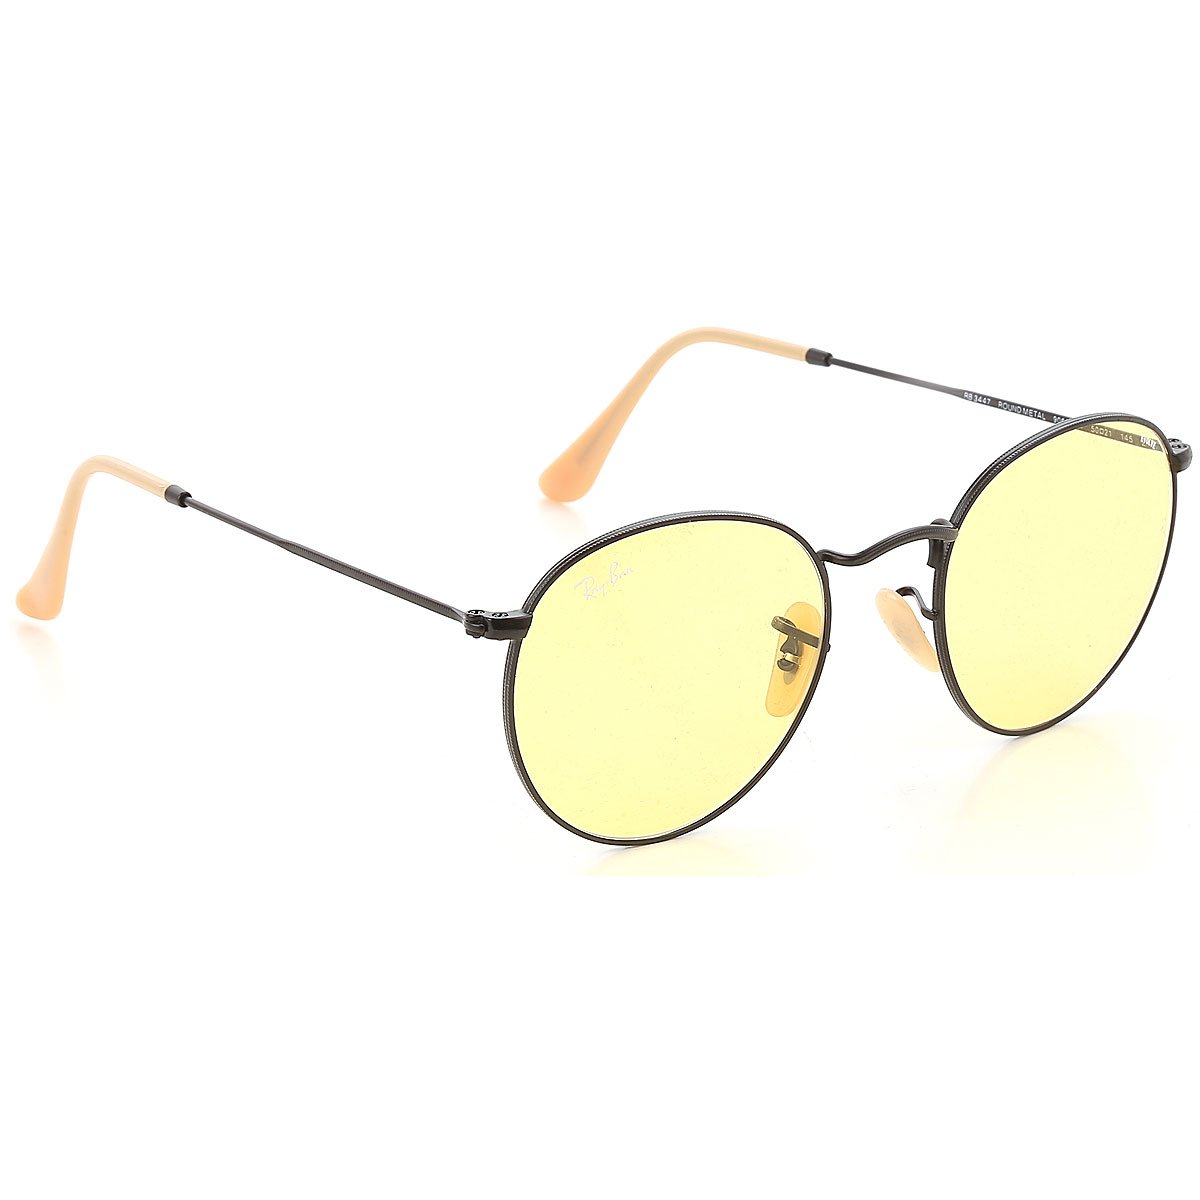 Ray Ban Sunglasses On Sale, Black, 2019